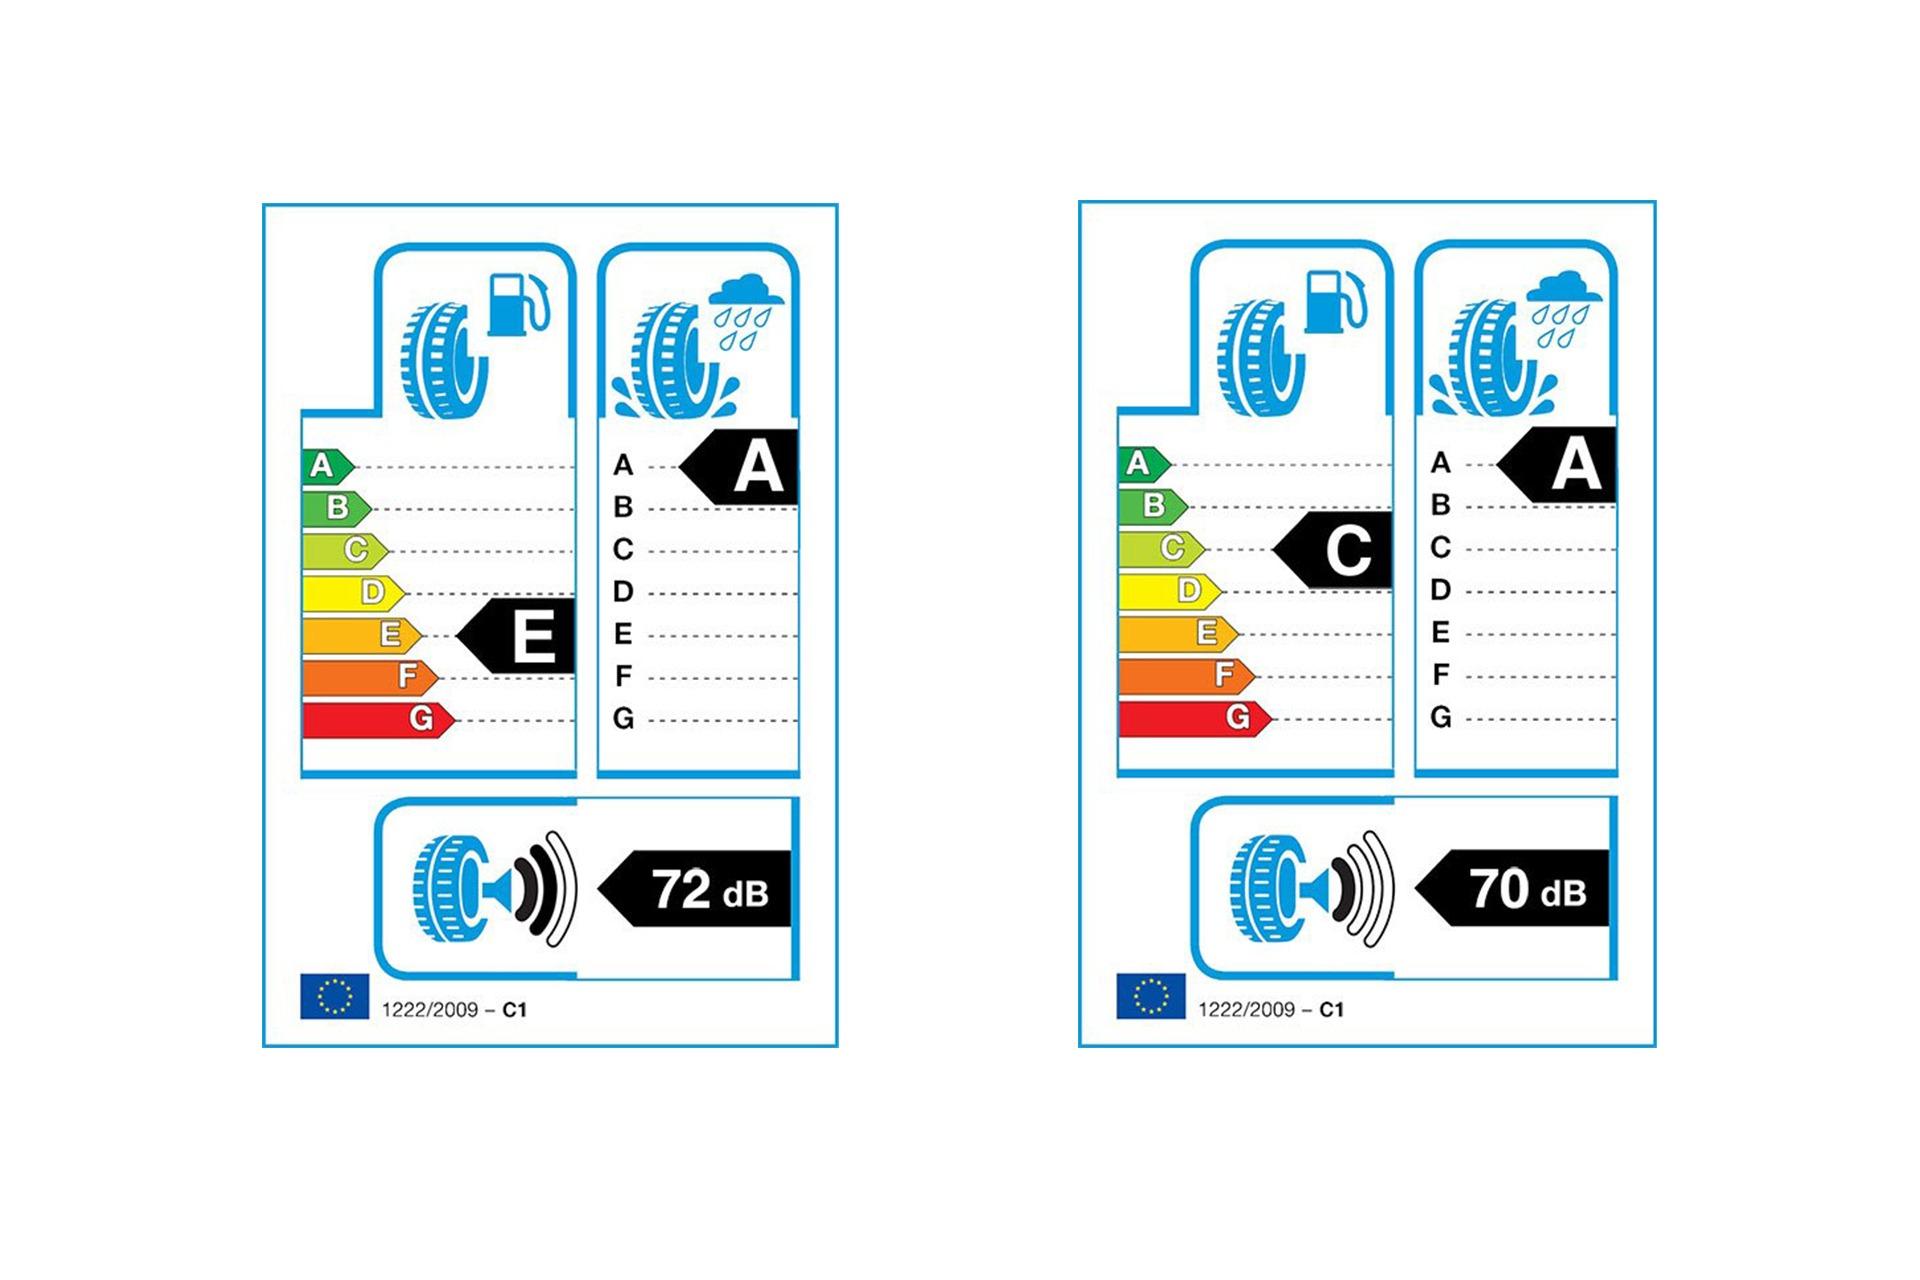 Foto: EU-Reifenlabel für Conti Sport Contact 5P 245/35 ZR21 96 Y und Michelin Pilot Sport PS2 265/35 ZR21 101 Y